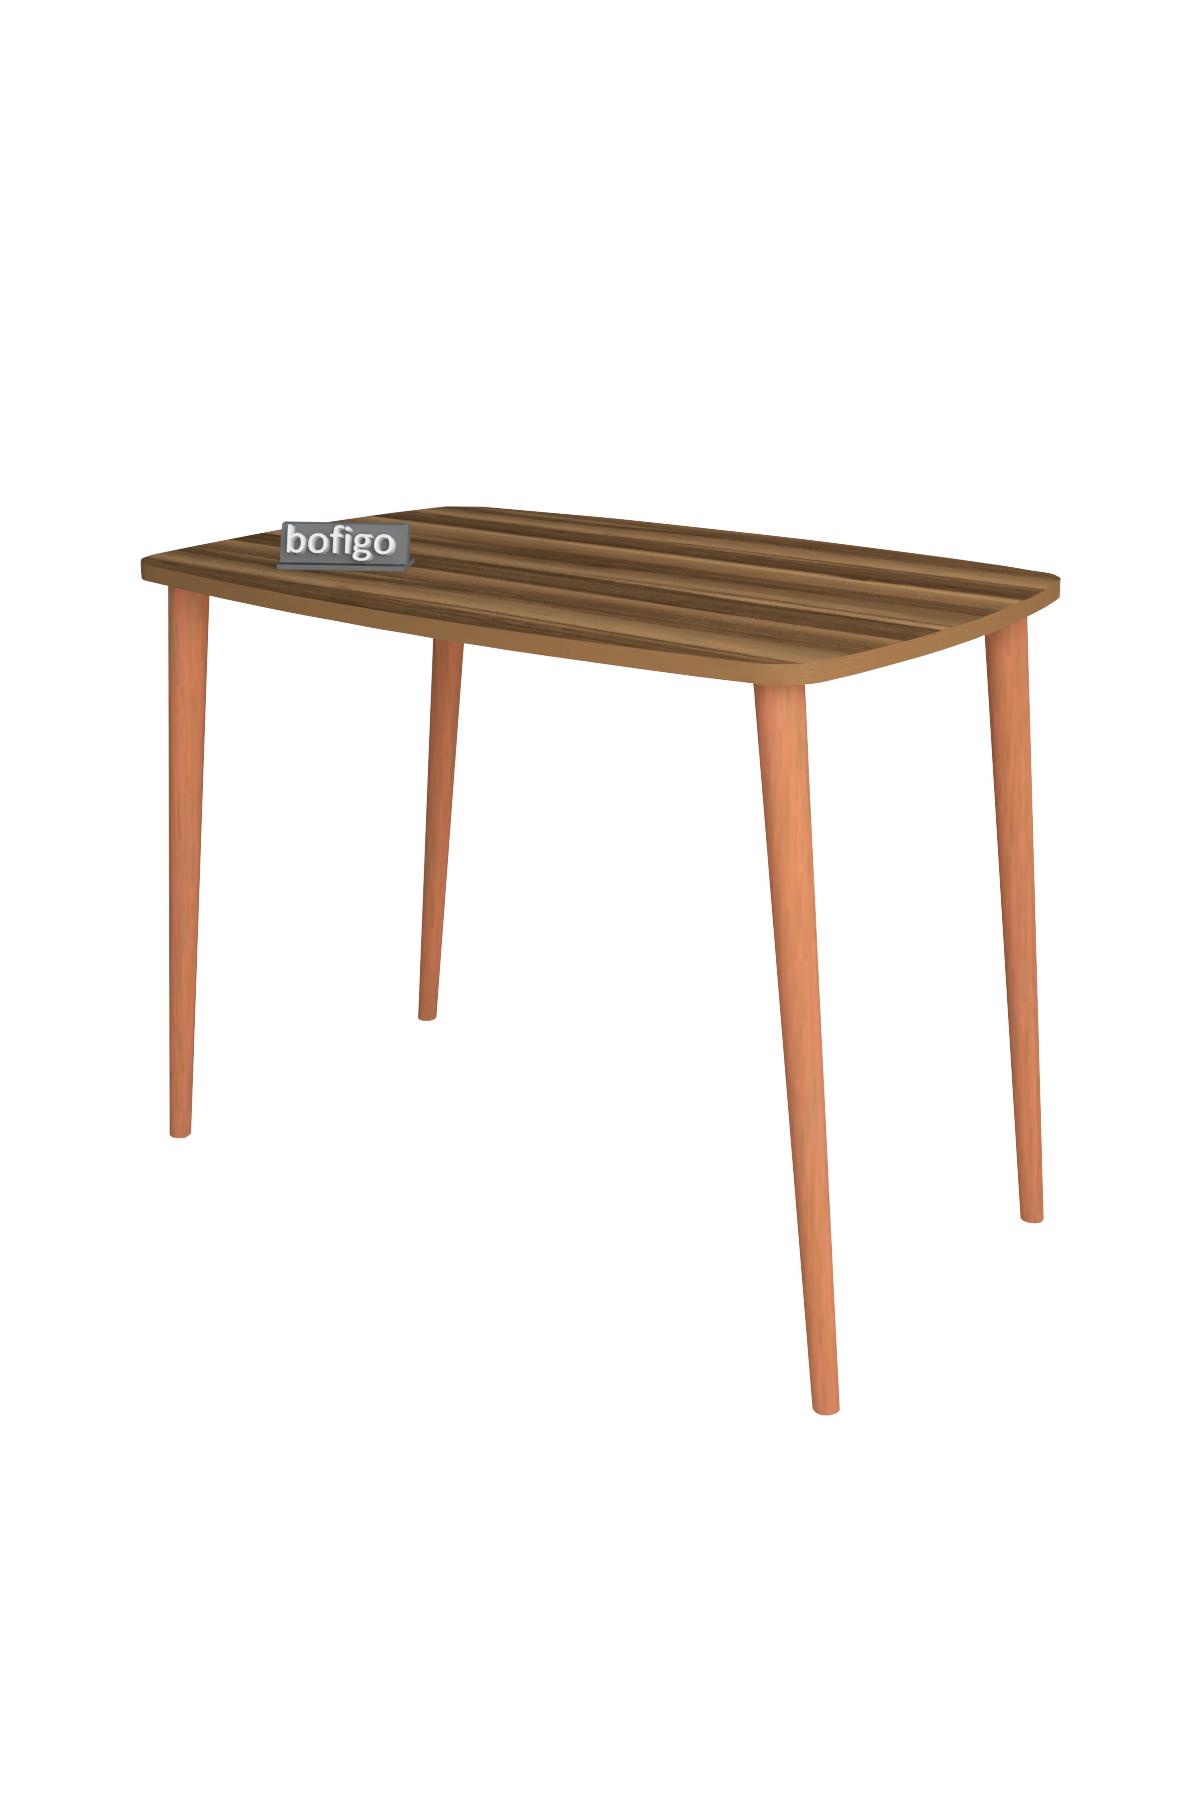 Bofigo Desk 60x90 Cm Walnut (Wooden Leg)